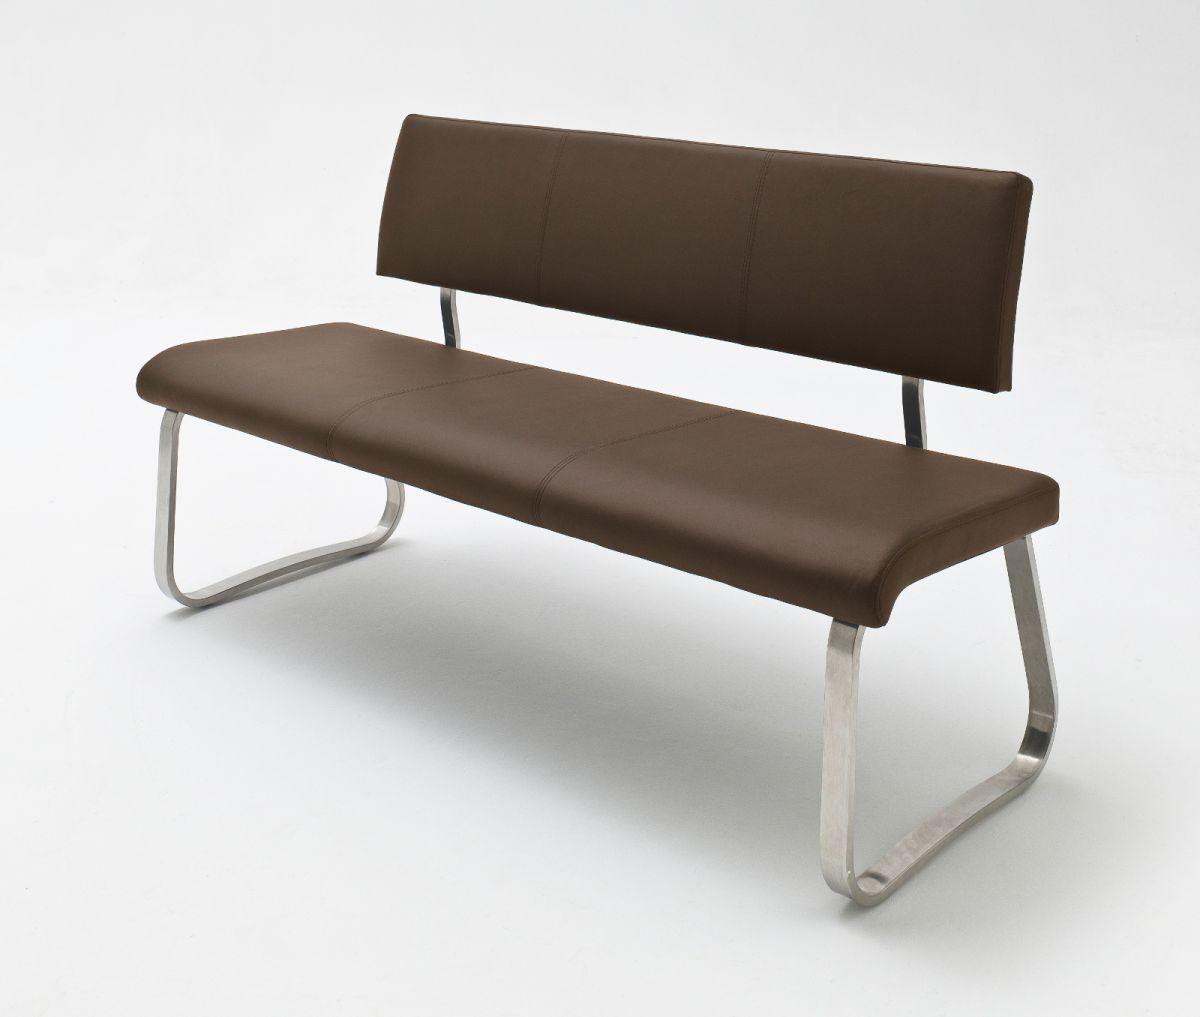 Sitzbank Arco Braun Kunstleder 155 cm